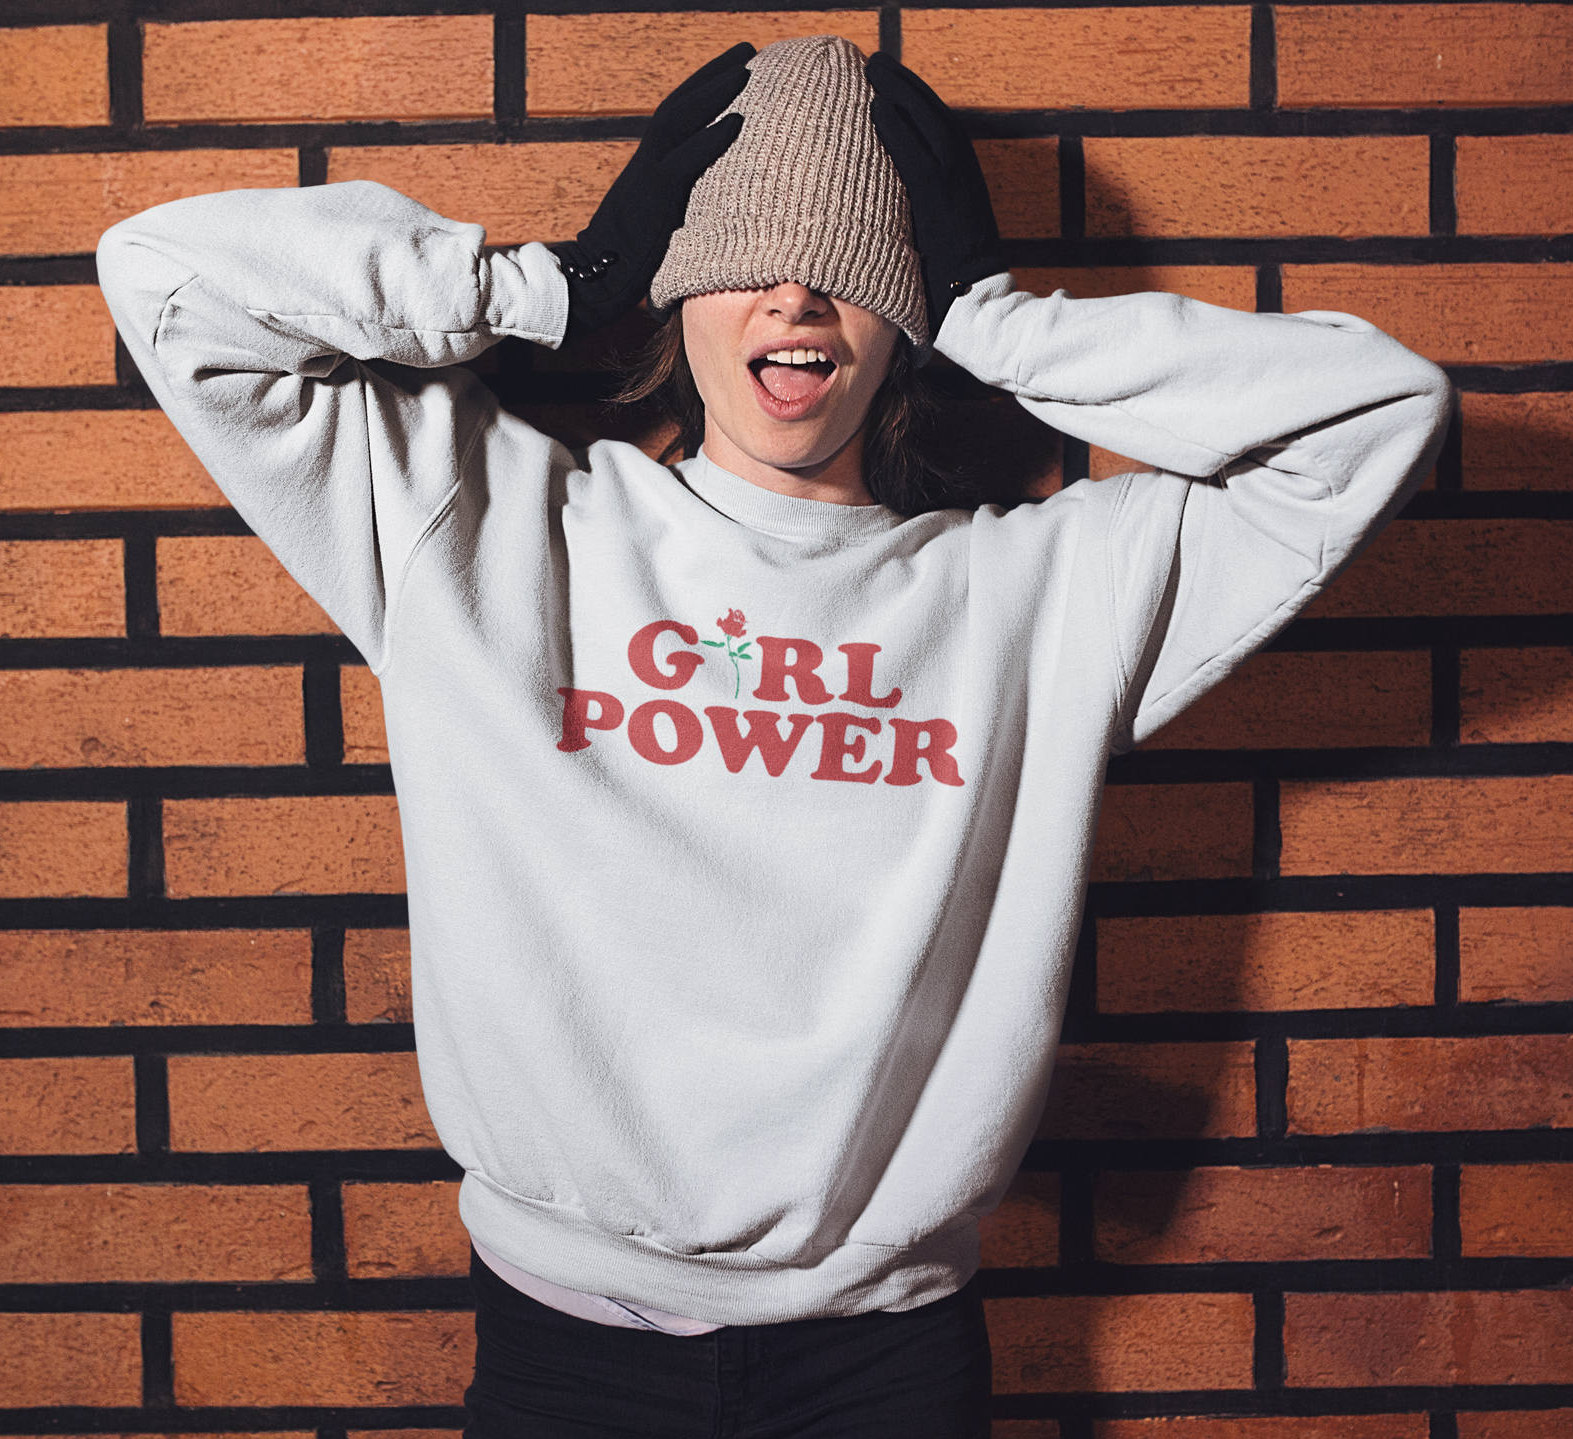 Feminism Girl Power Sweatshirt, Girl Power Sweater Feminist Super Soft Feel, Crewneck Sweatshirt Girl Power Rose 100% Cotton Unisex Outfit